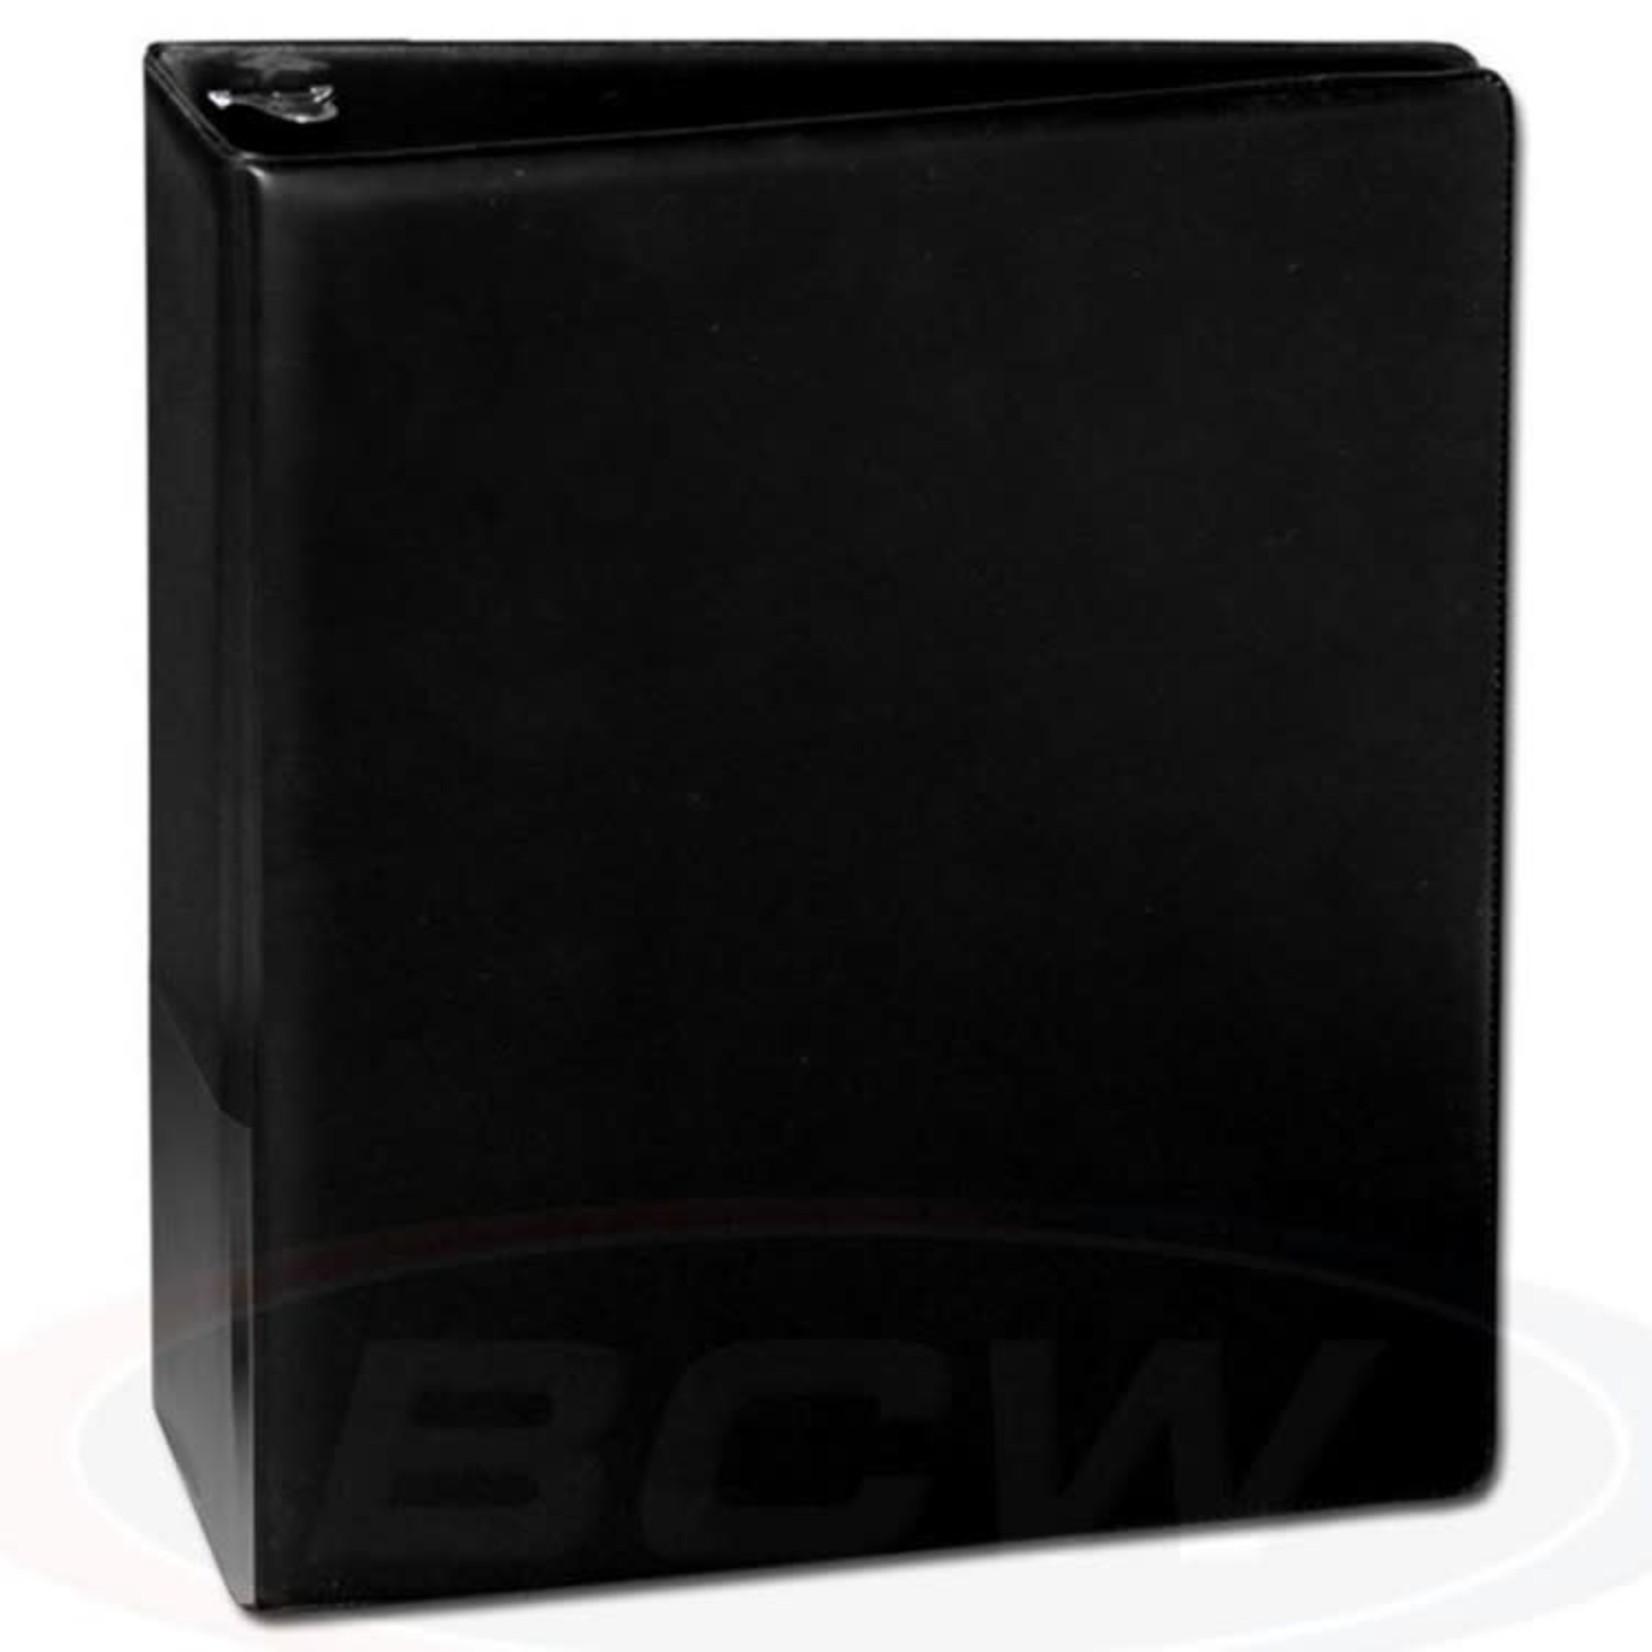 "BCW Supplies 2"" Black Binder"